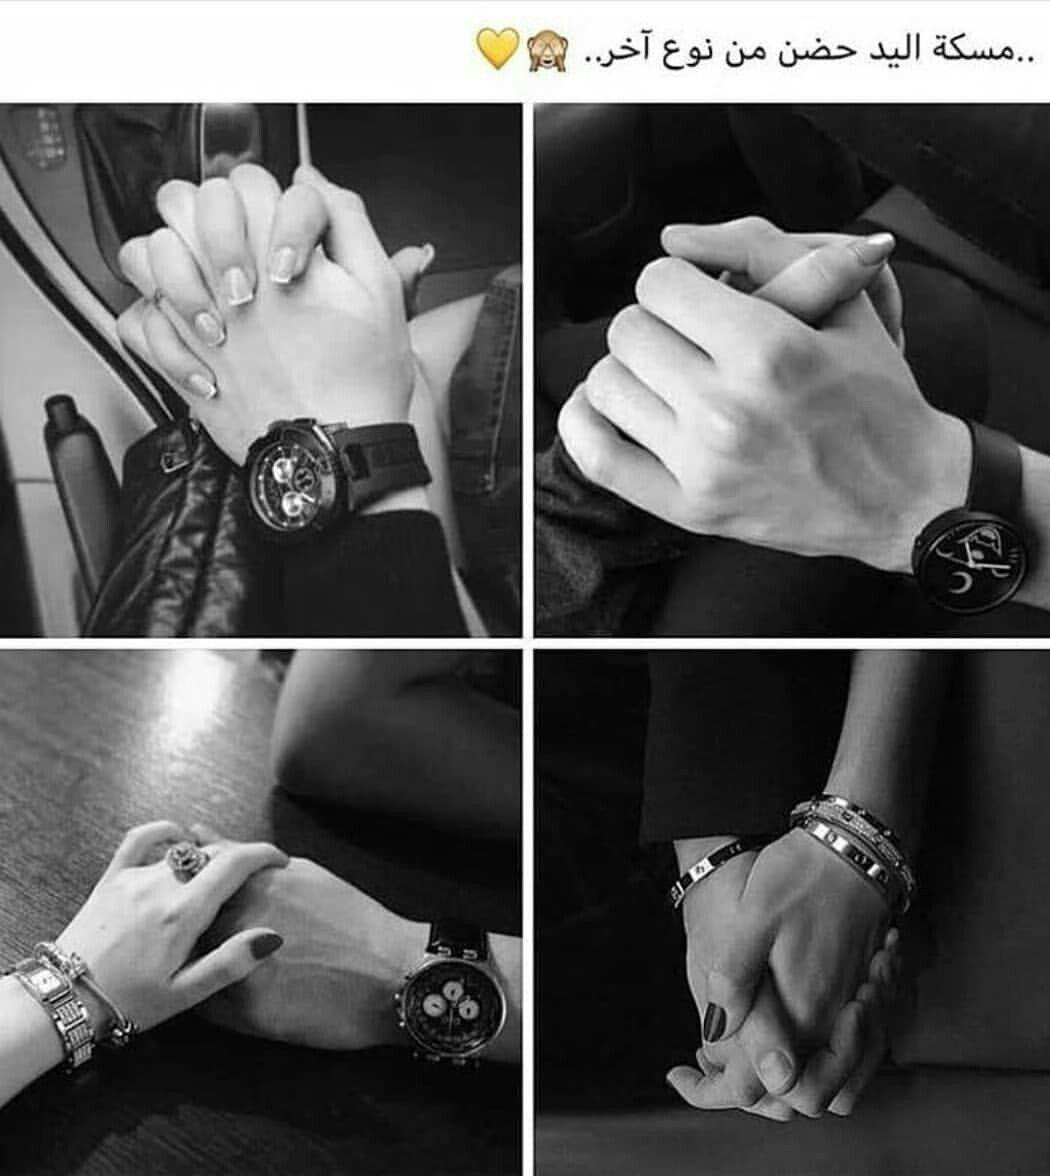 Pin By المبتسم دائما بيشو On أهملت قلبي Classy Couple Rings For Men Hands